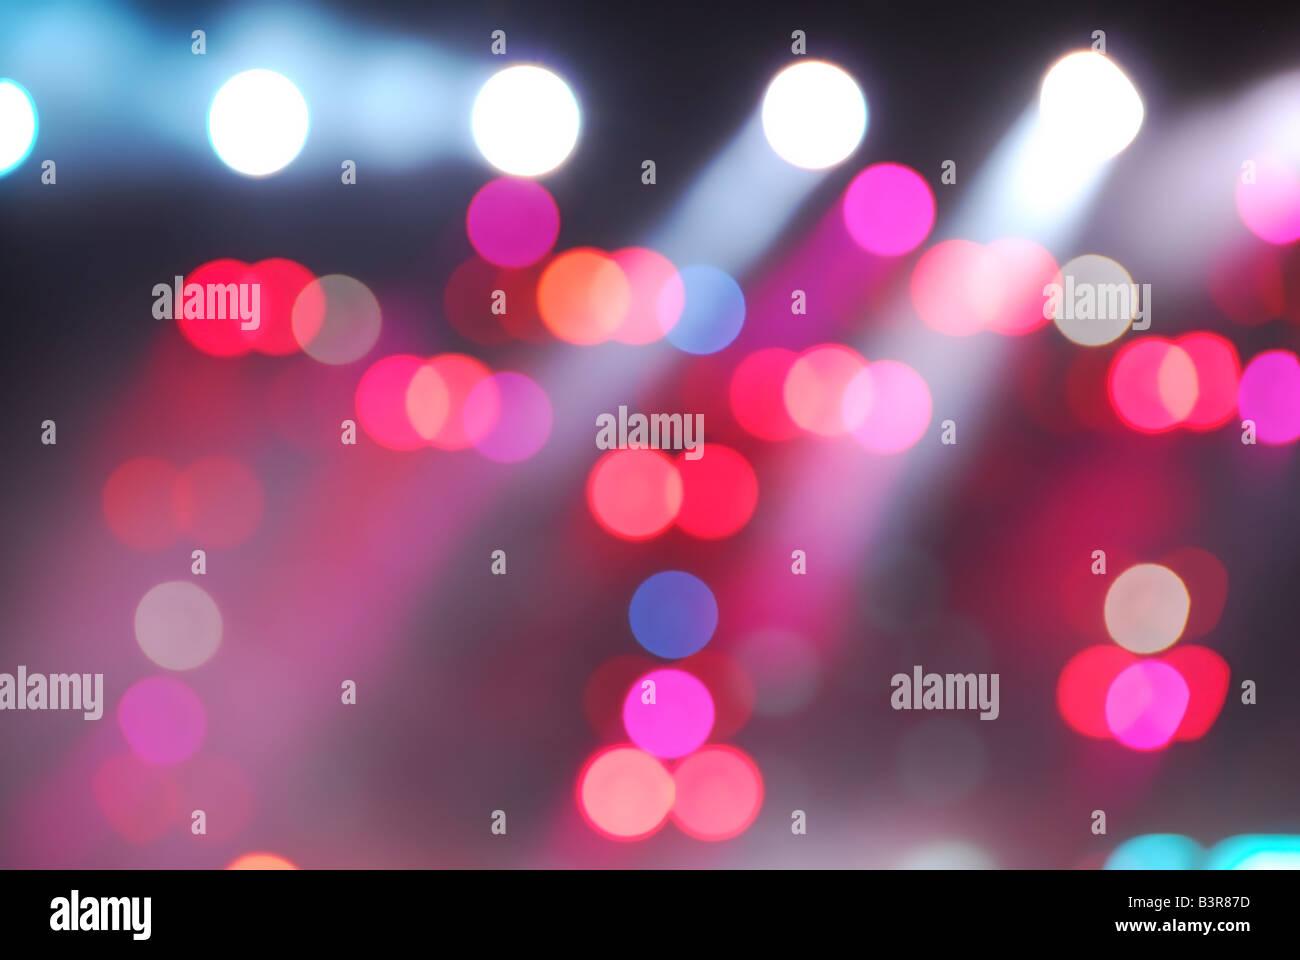 glowing light background - Stock Image